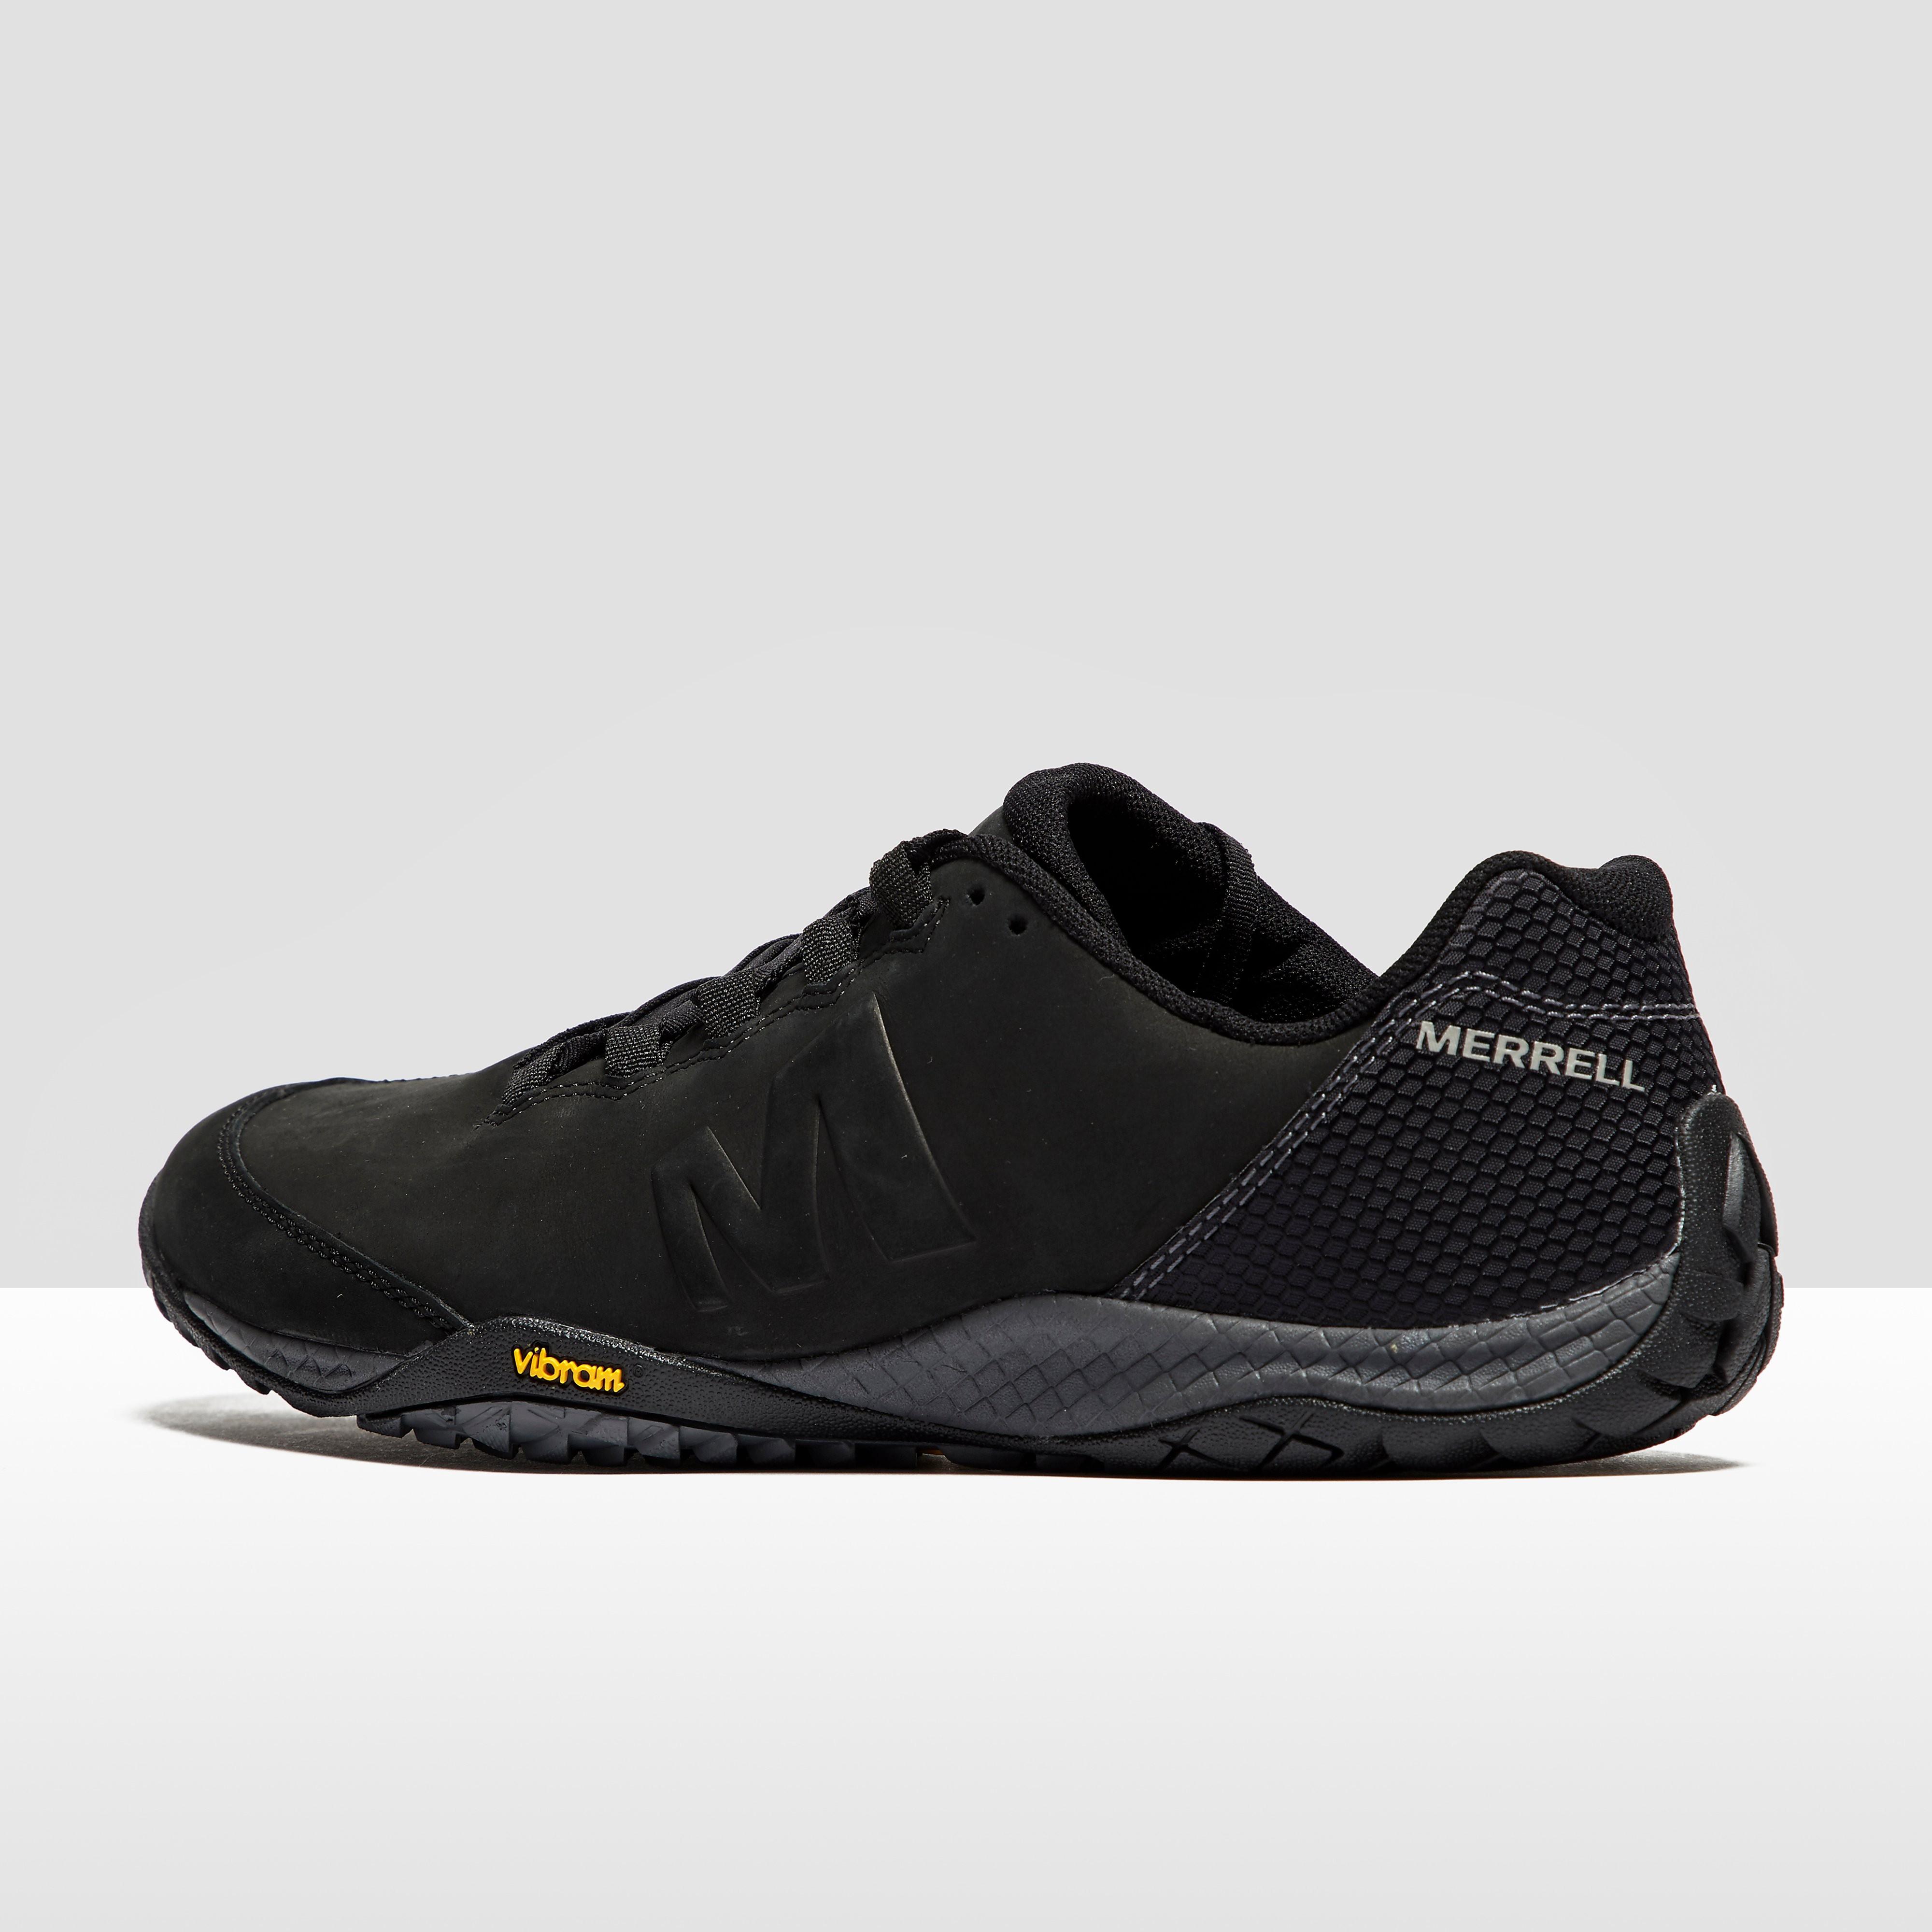 Merrell Parkway Emboss Lace Men's Walking Shoes